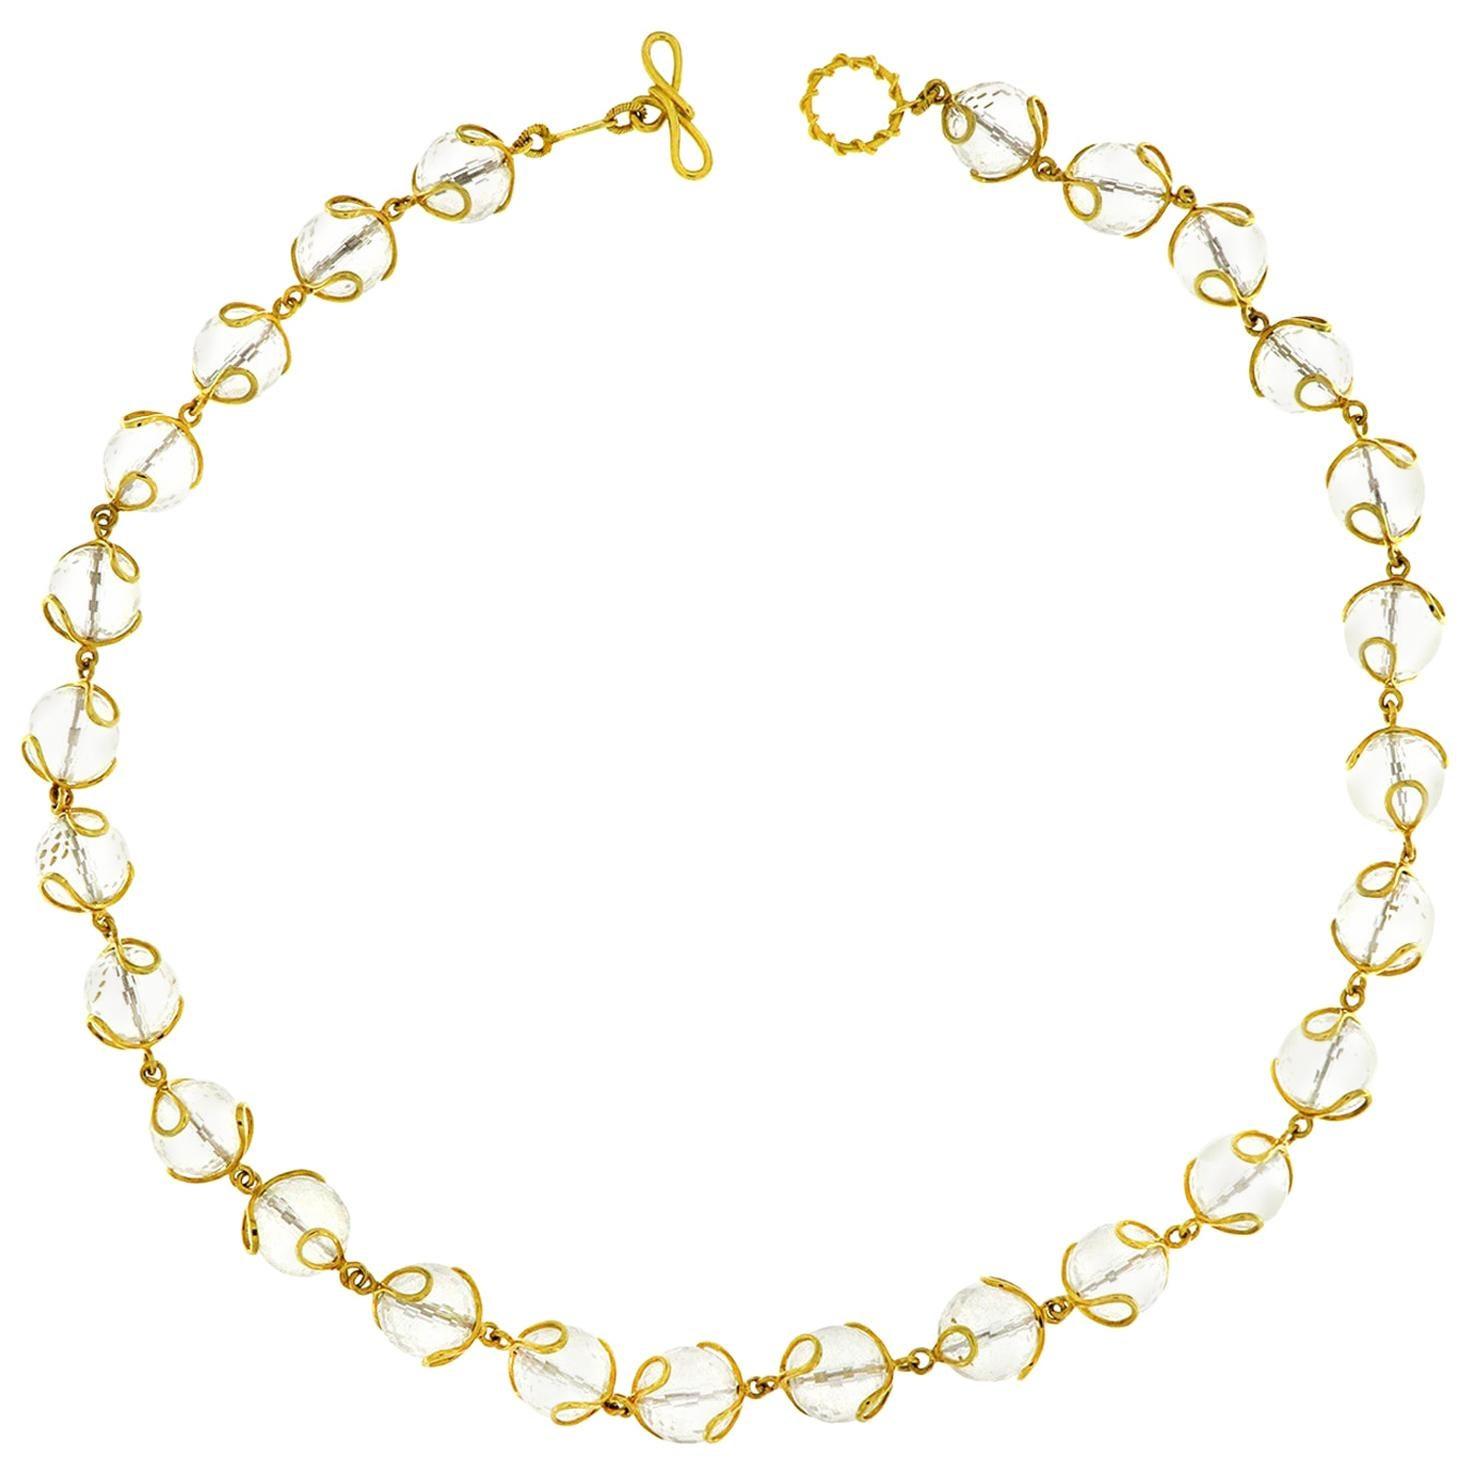 Valentin Magro Carina Crystal Ball Gold Necklace